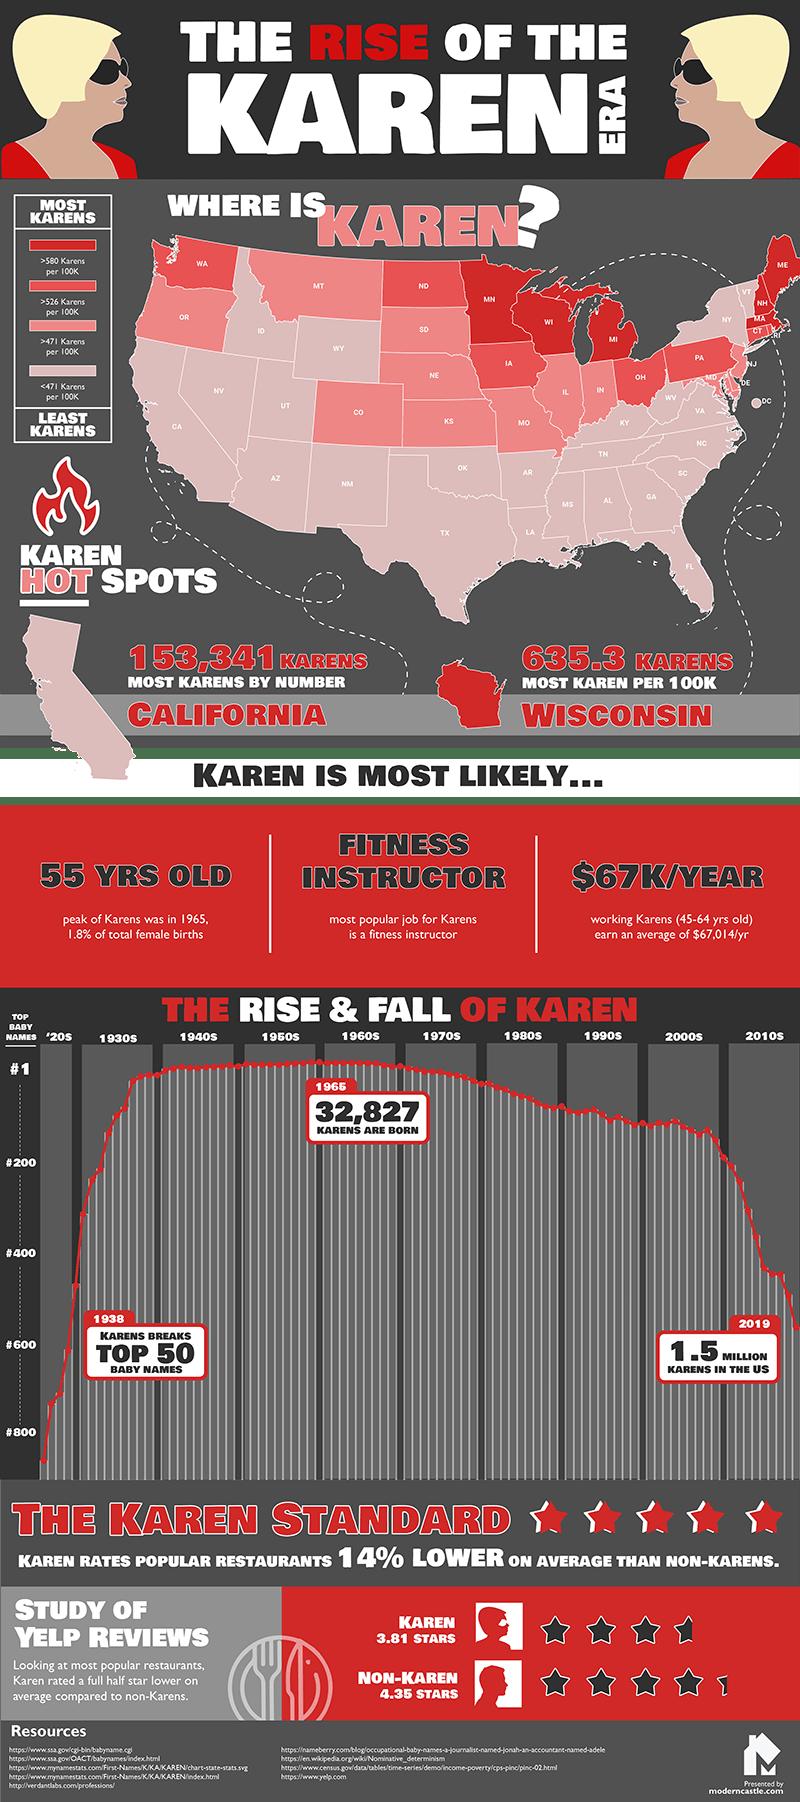 The Rise of the Karen Era